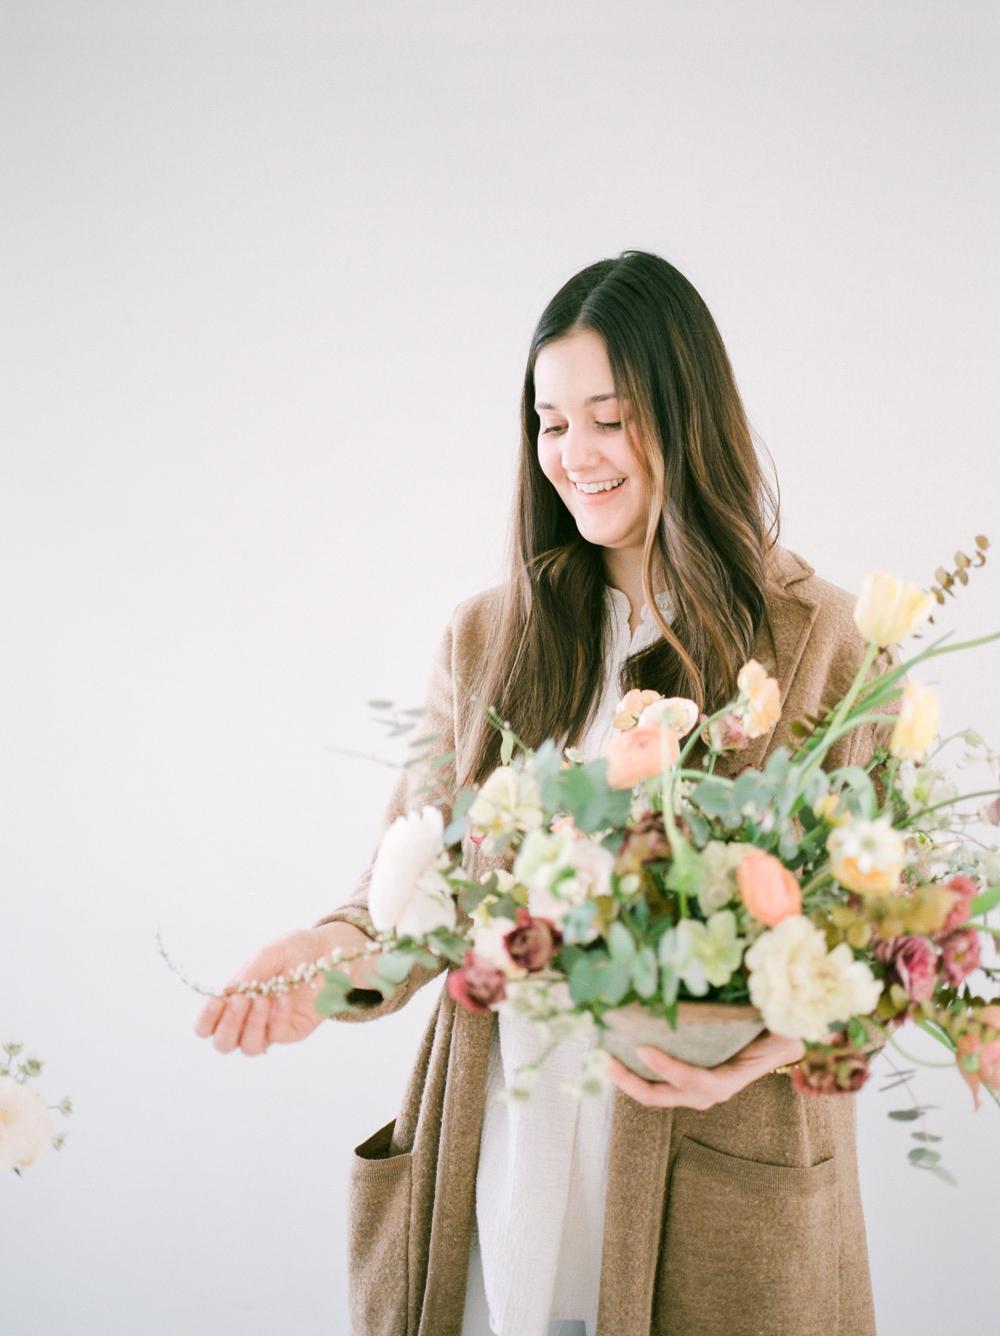 Christine-Gosch-Lexie-Sandberg-Carpe-diem-flowers-florals-design-wedding-flowers-salt-lake-city-branding-photos-styling-bridal-bouquet-centerpieces-film-photographer-9.jpg